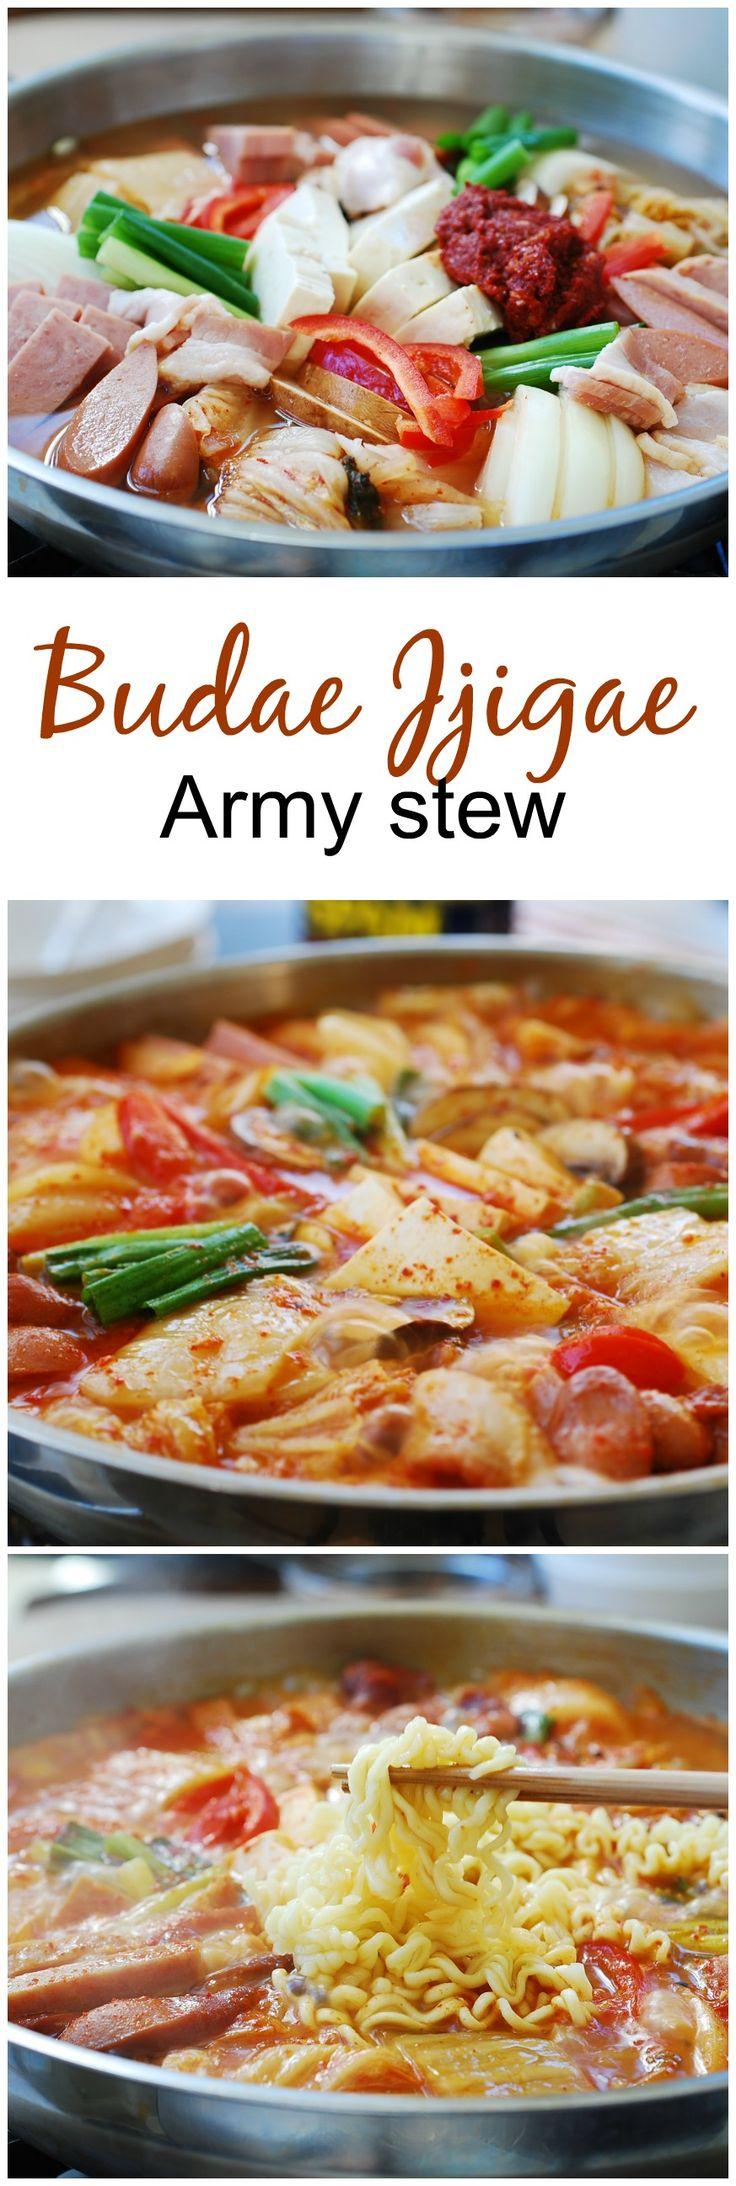 532 best korean food korean bapsang images on pinterest korean budae jjigae army stew korean hot dog recipekorean forumfinder Image collections